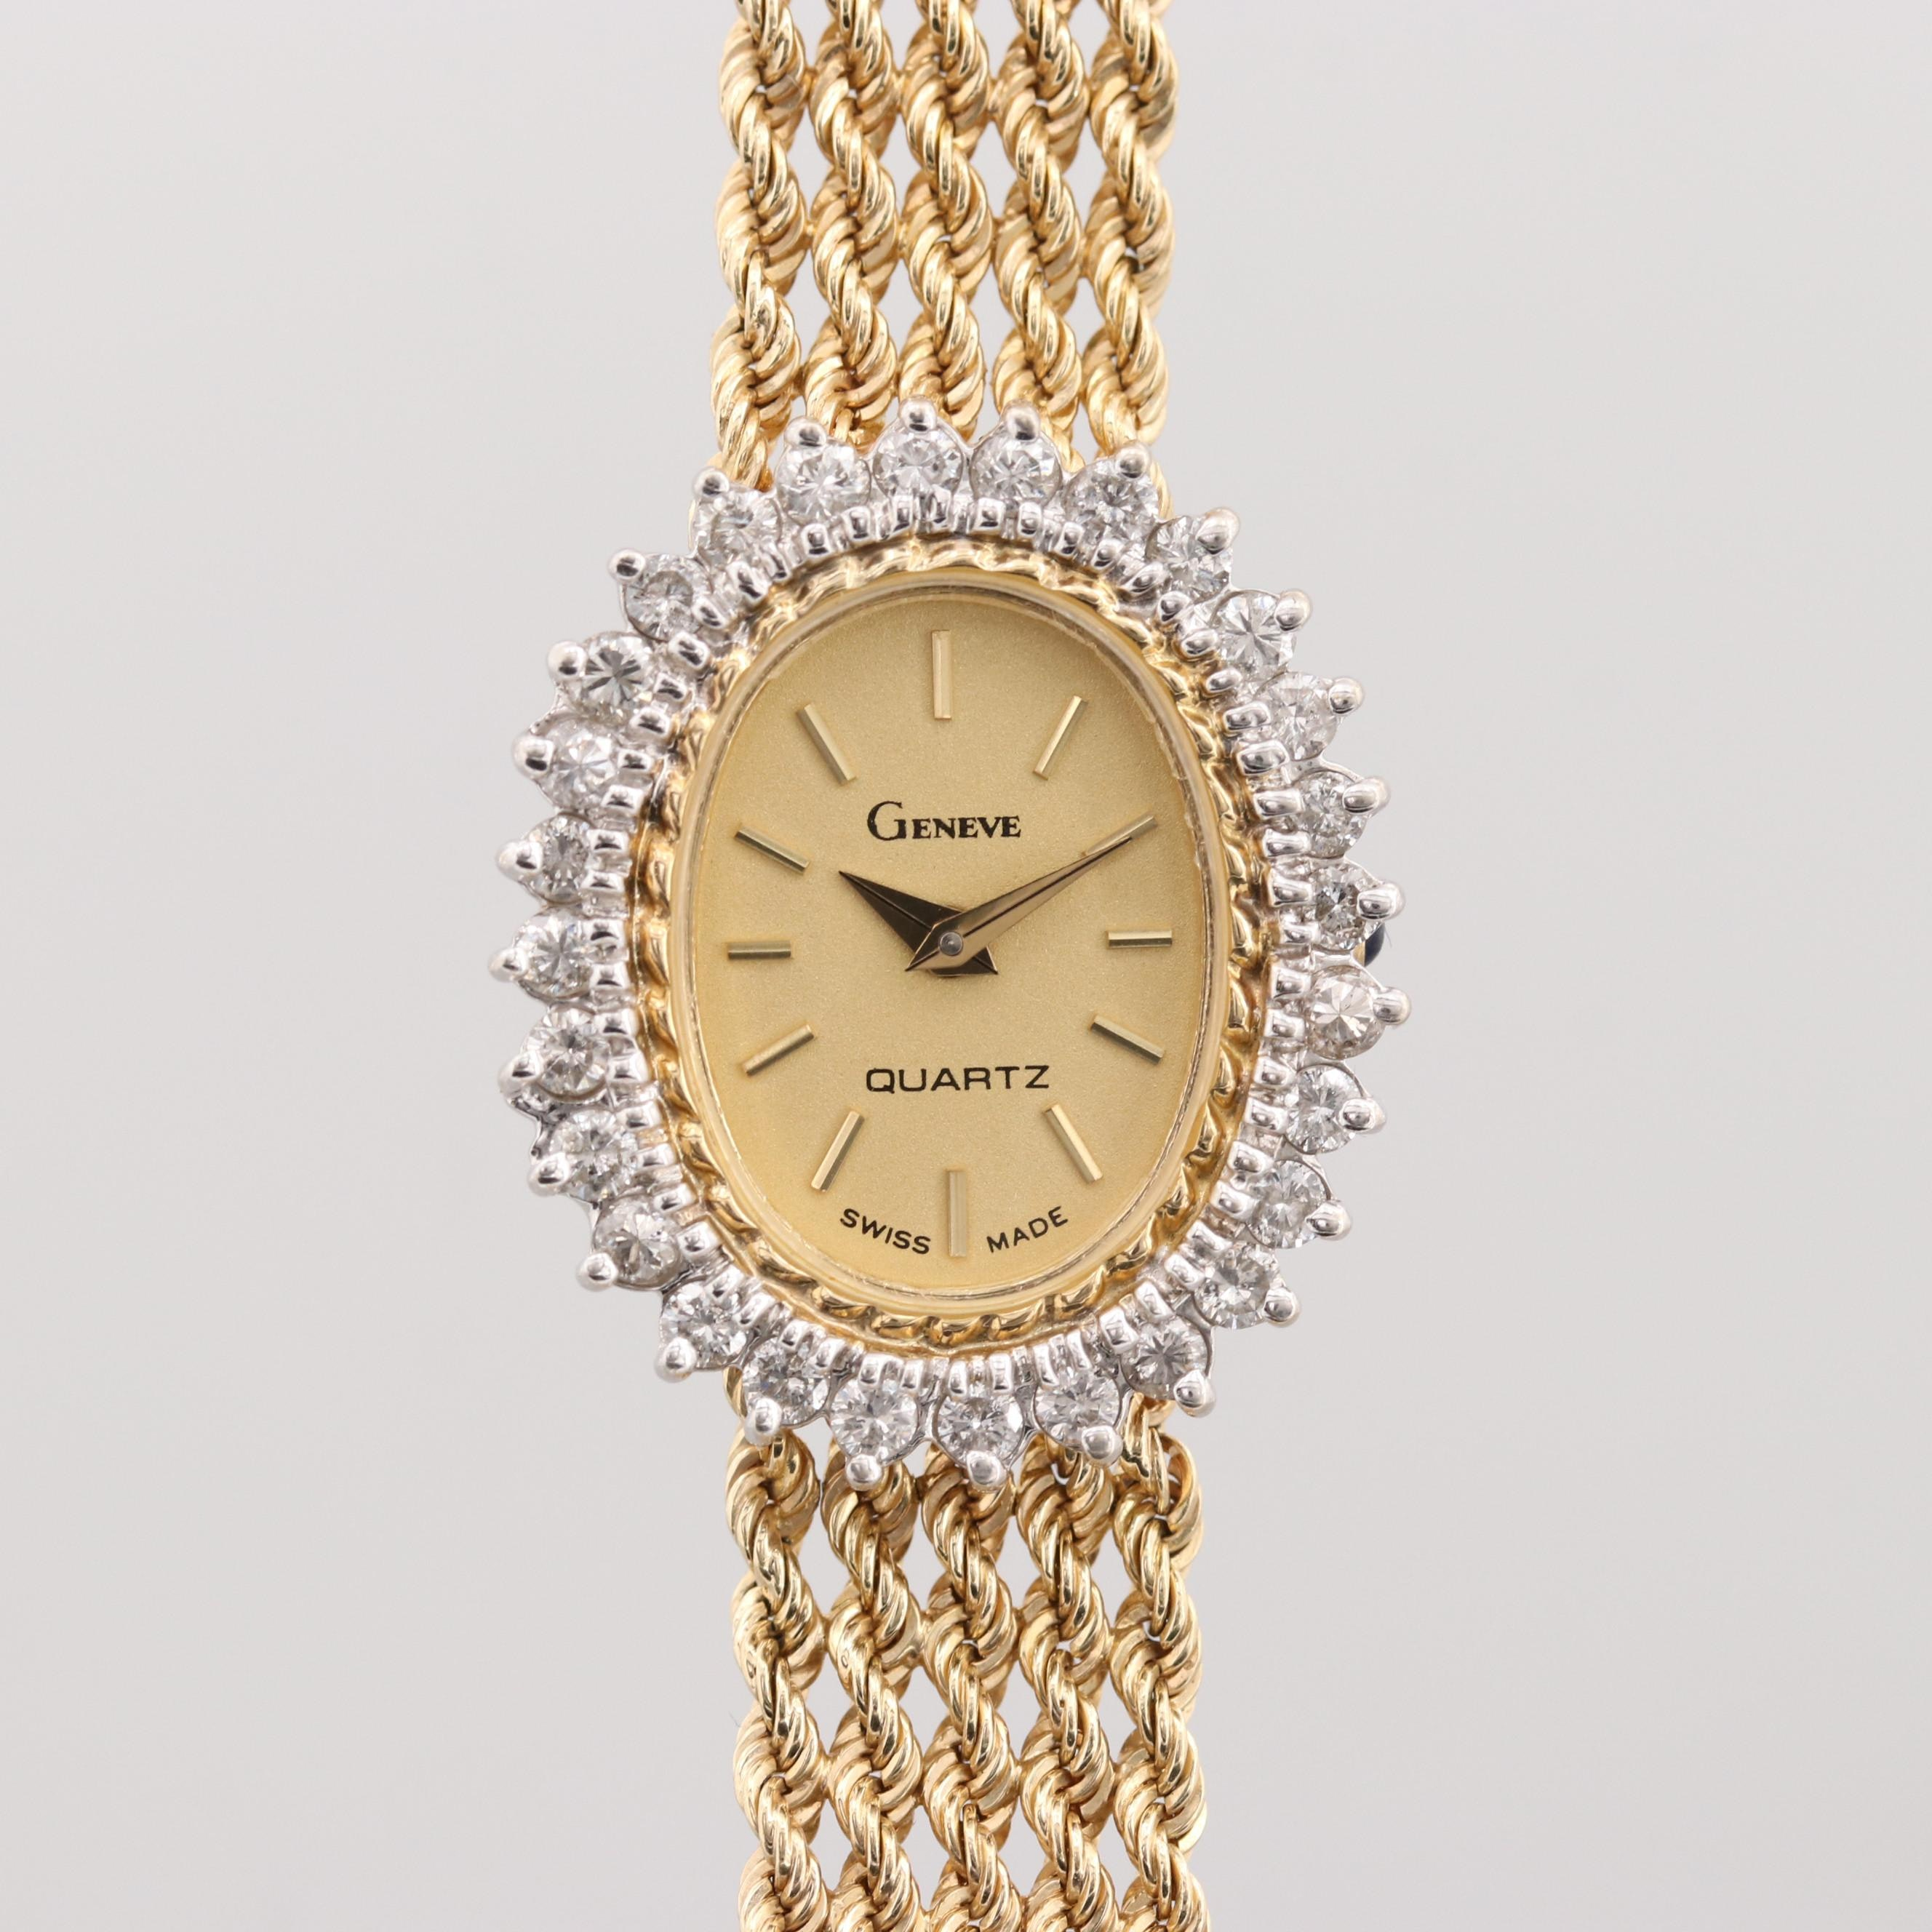 Vintage Geneve 14K Yellow Gold Diamond Quartz Wristwatch